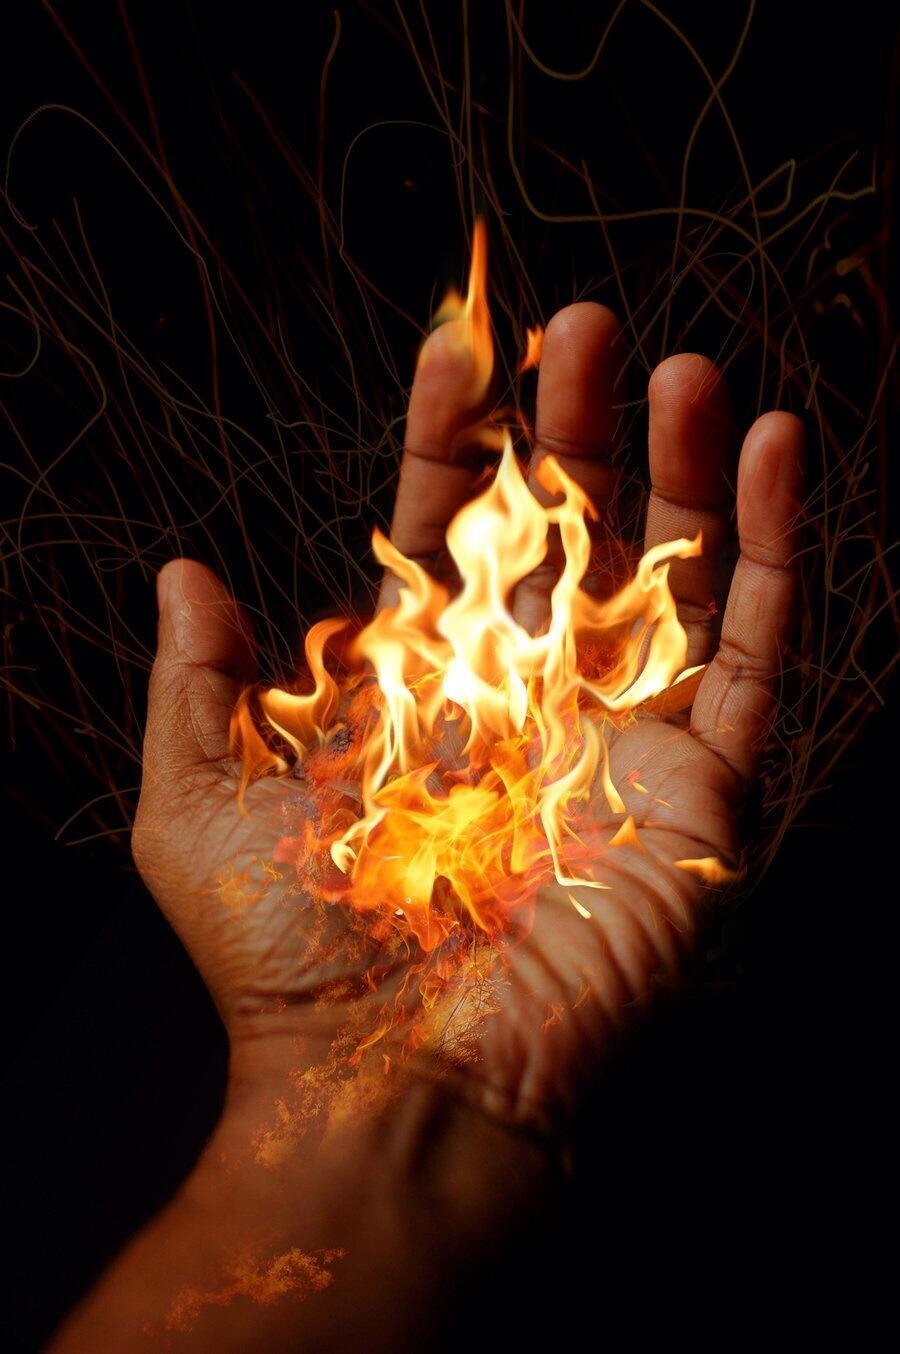 картинки огонь на теле новую плитку